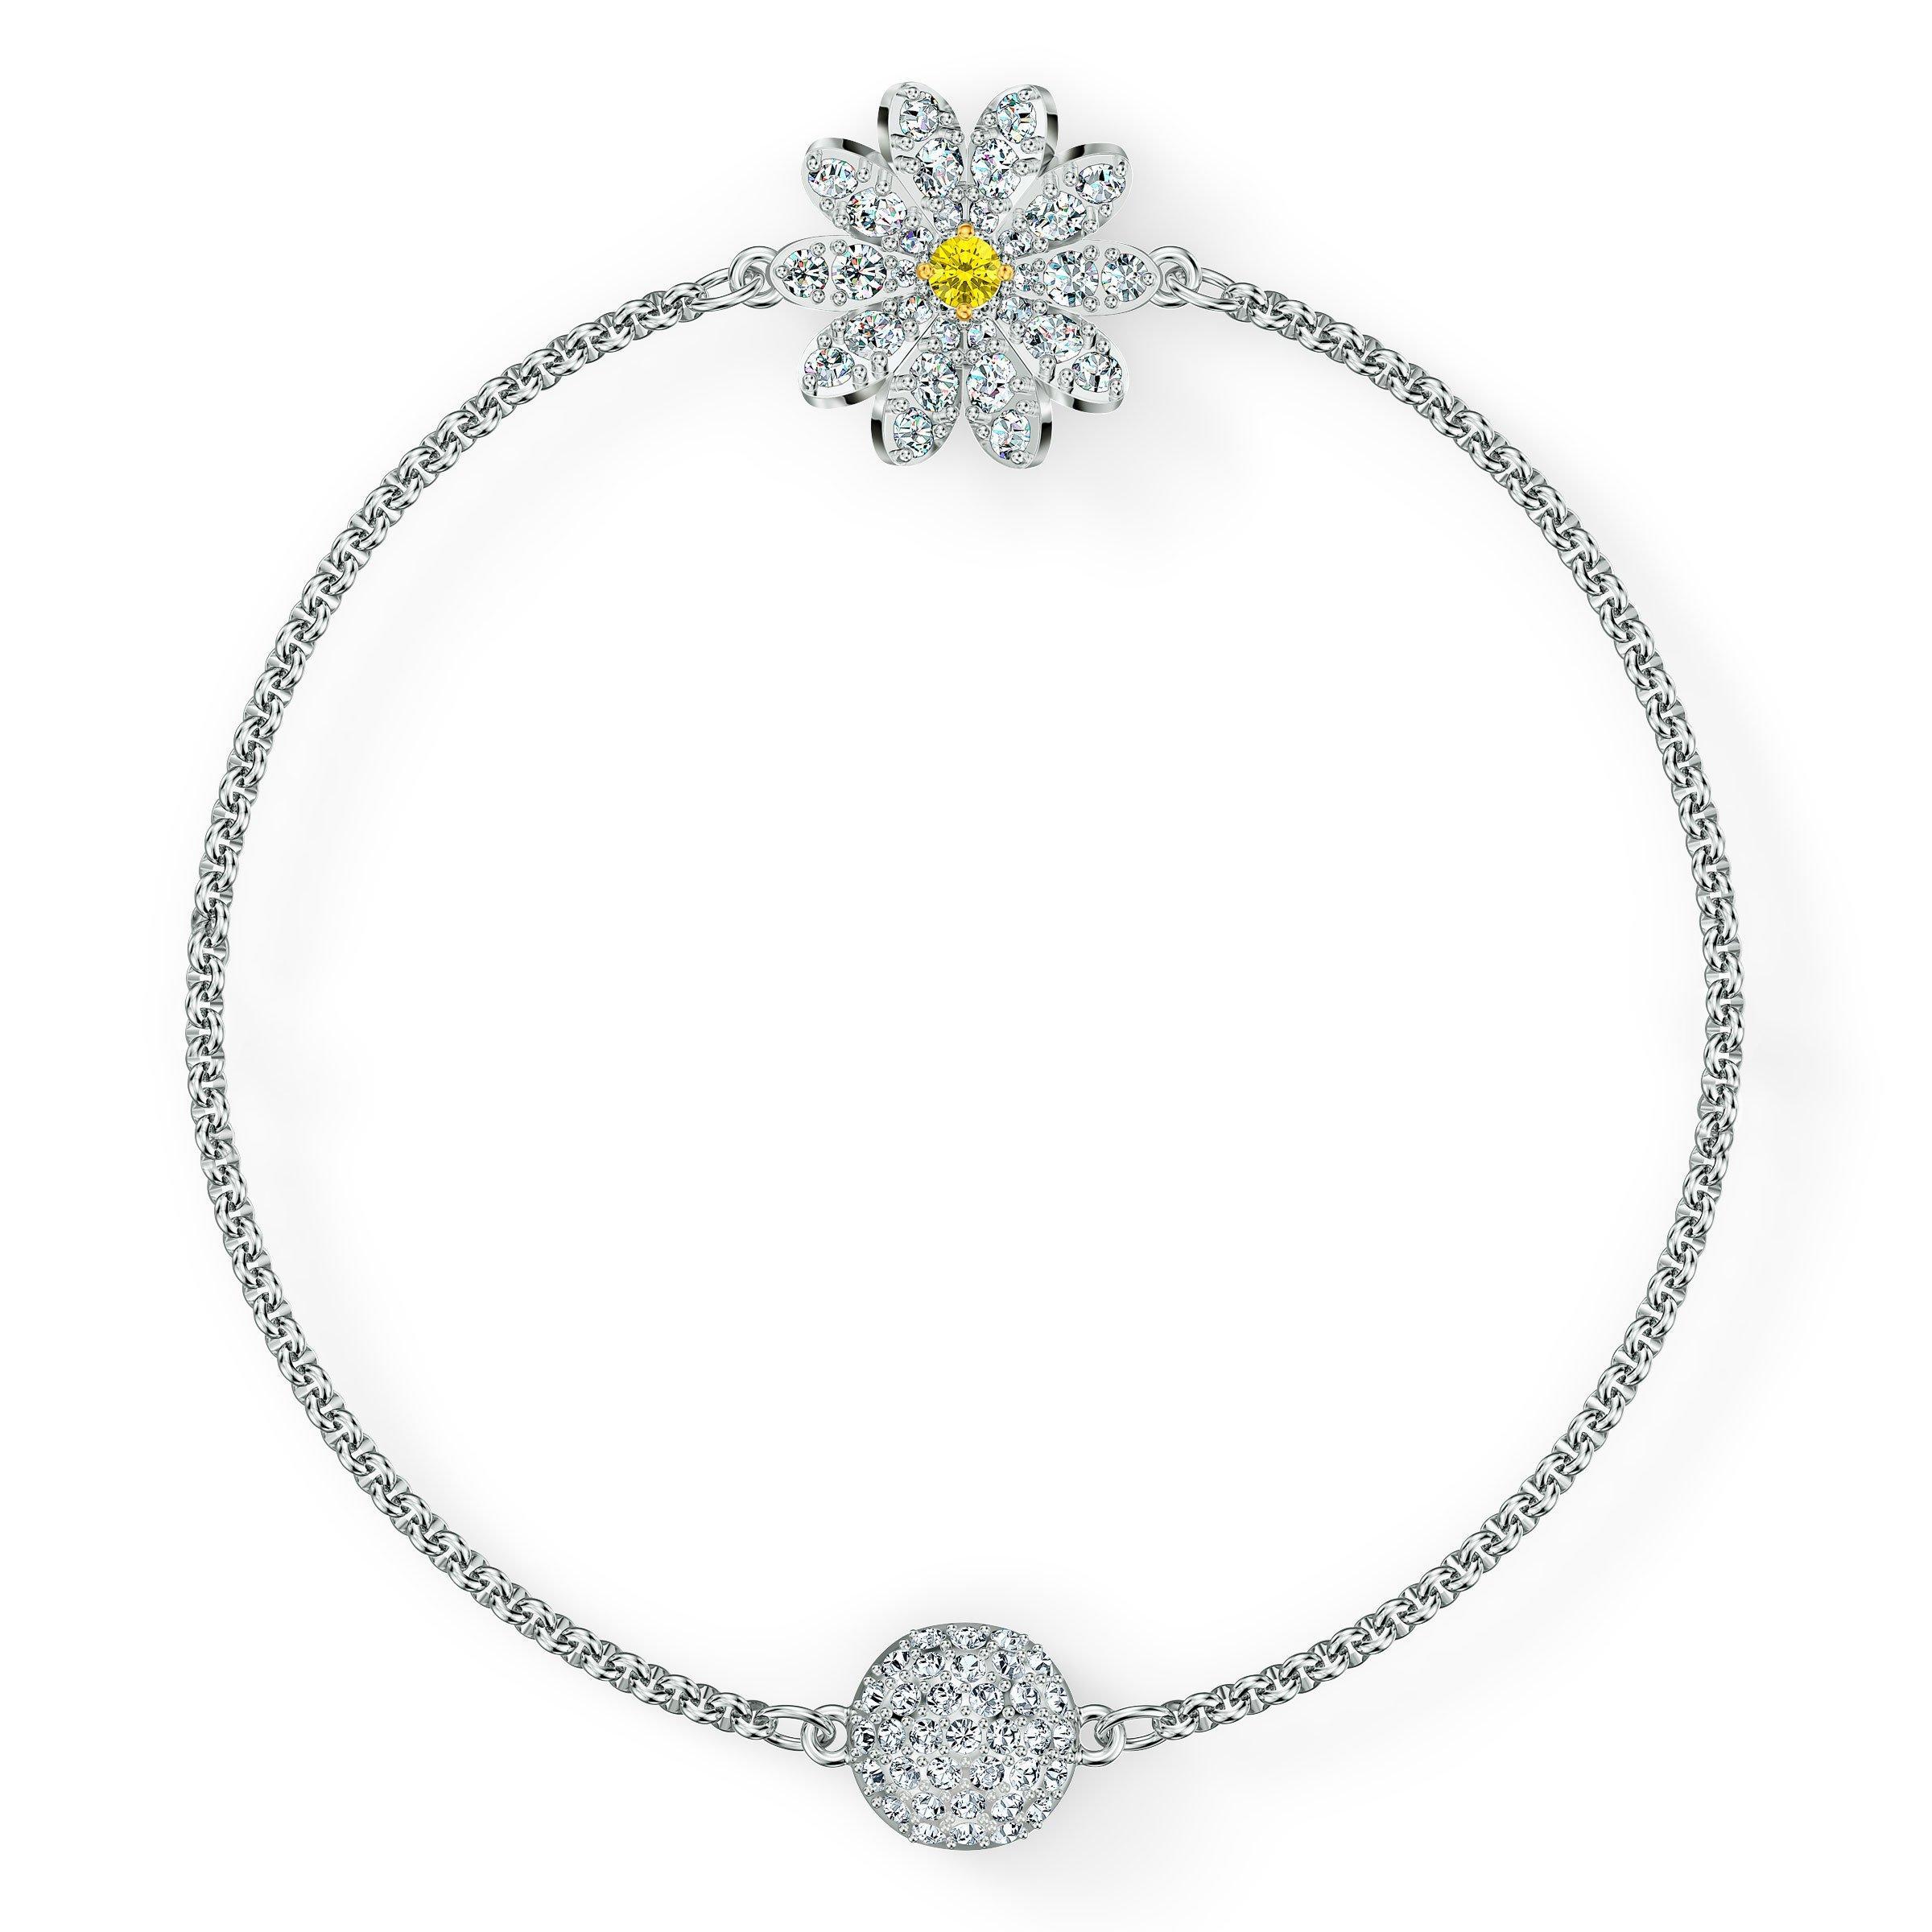 Swarovski Eternal Flower Silver Tone Bracelet